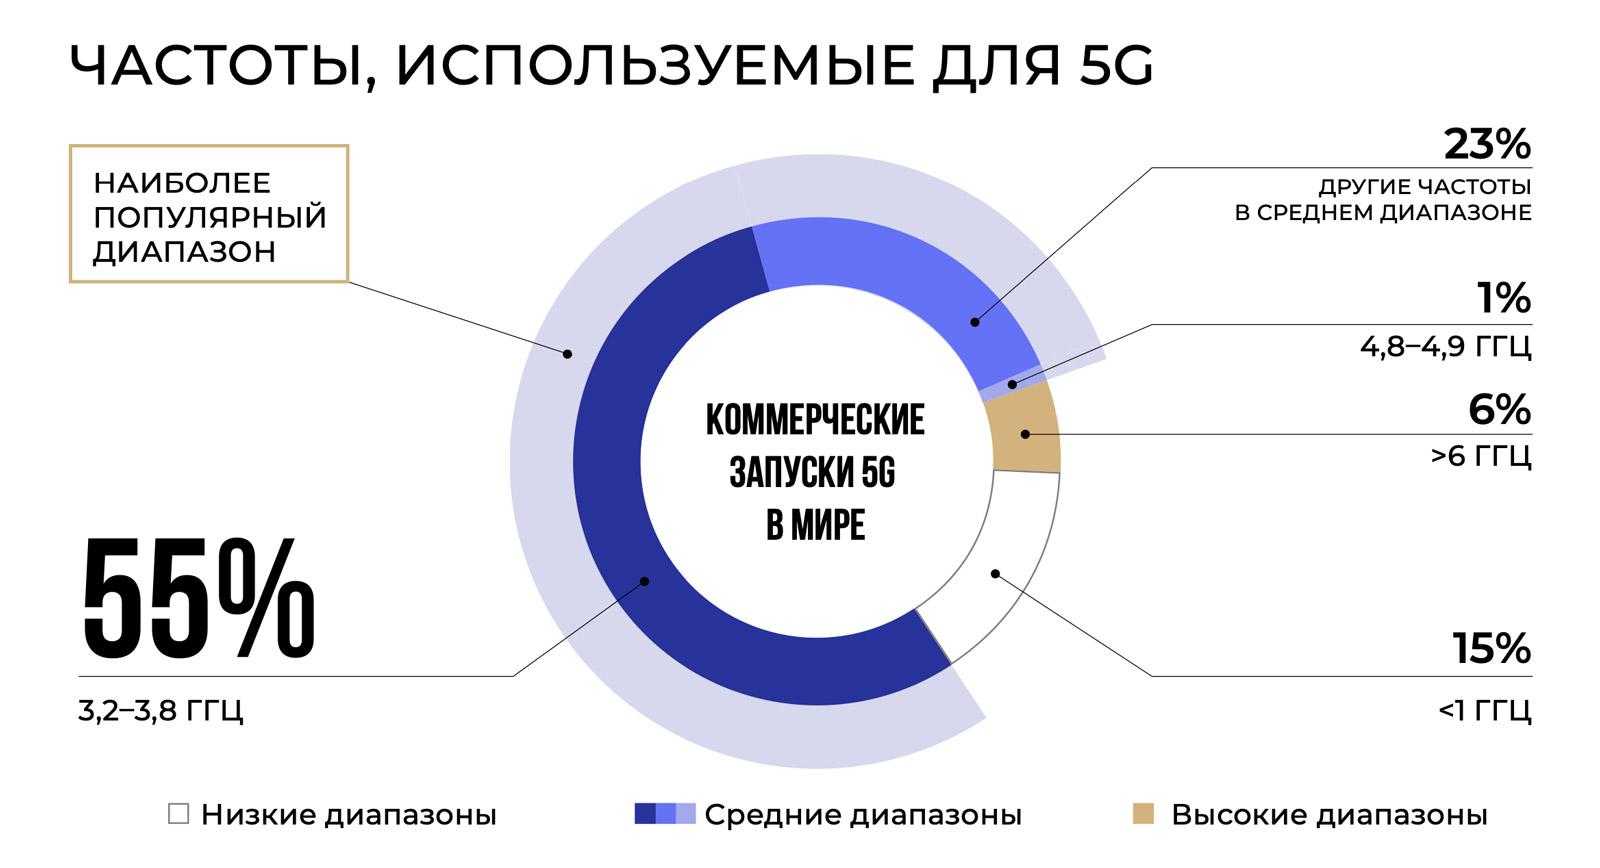 Россия готова к 5G – ждут операторы, ждут абоненты, ждут производители